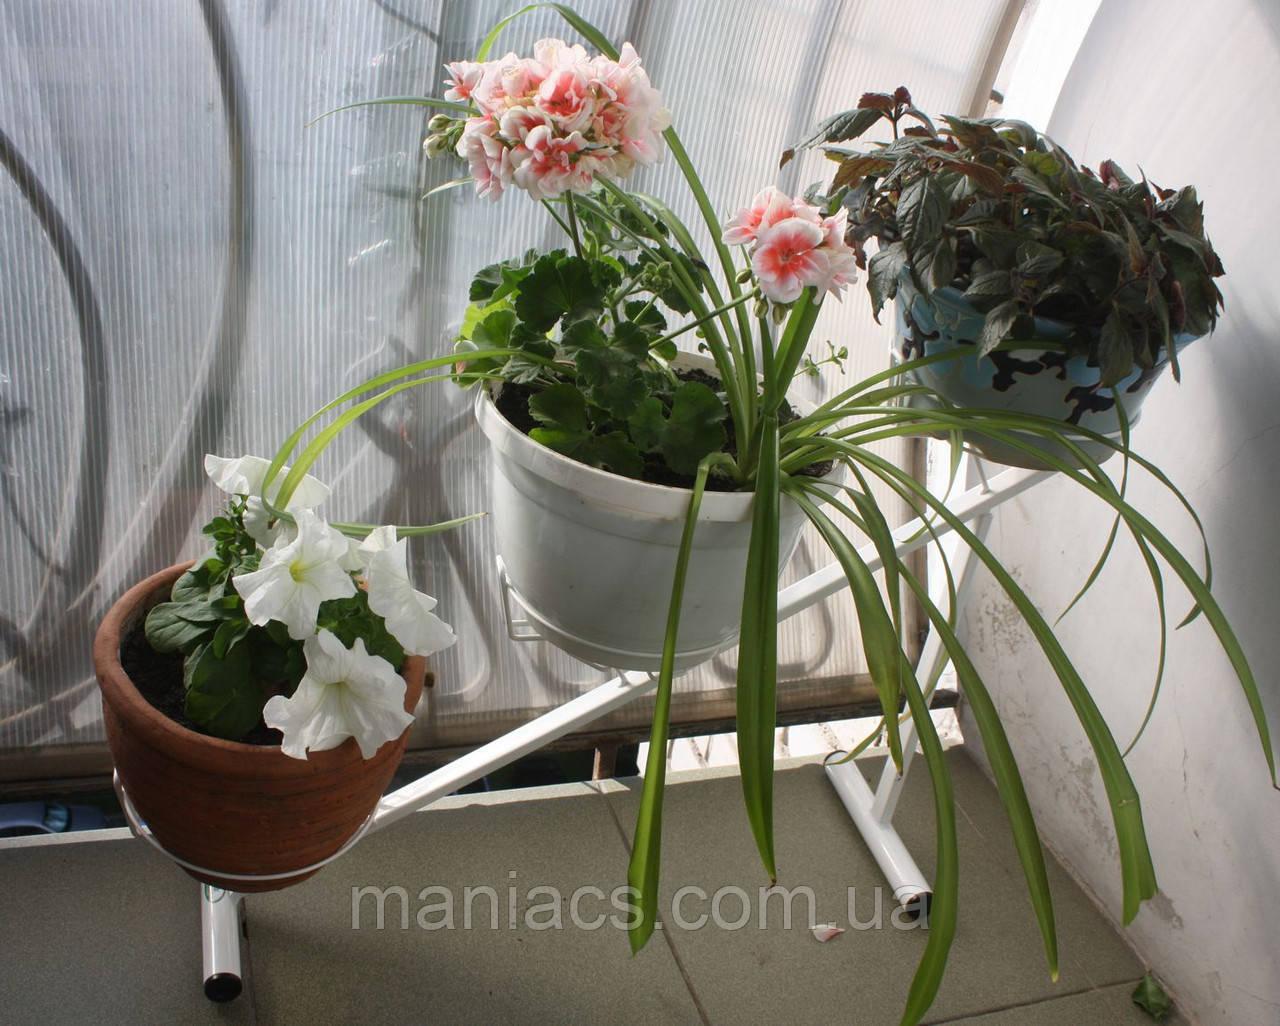 Аркадия, подставка для цветов